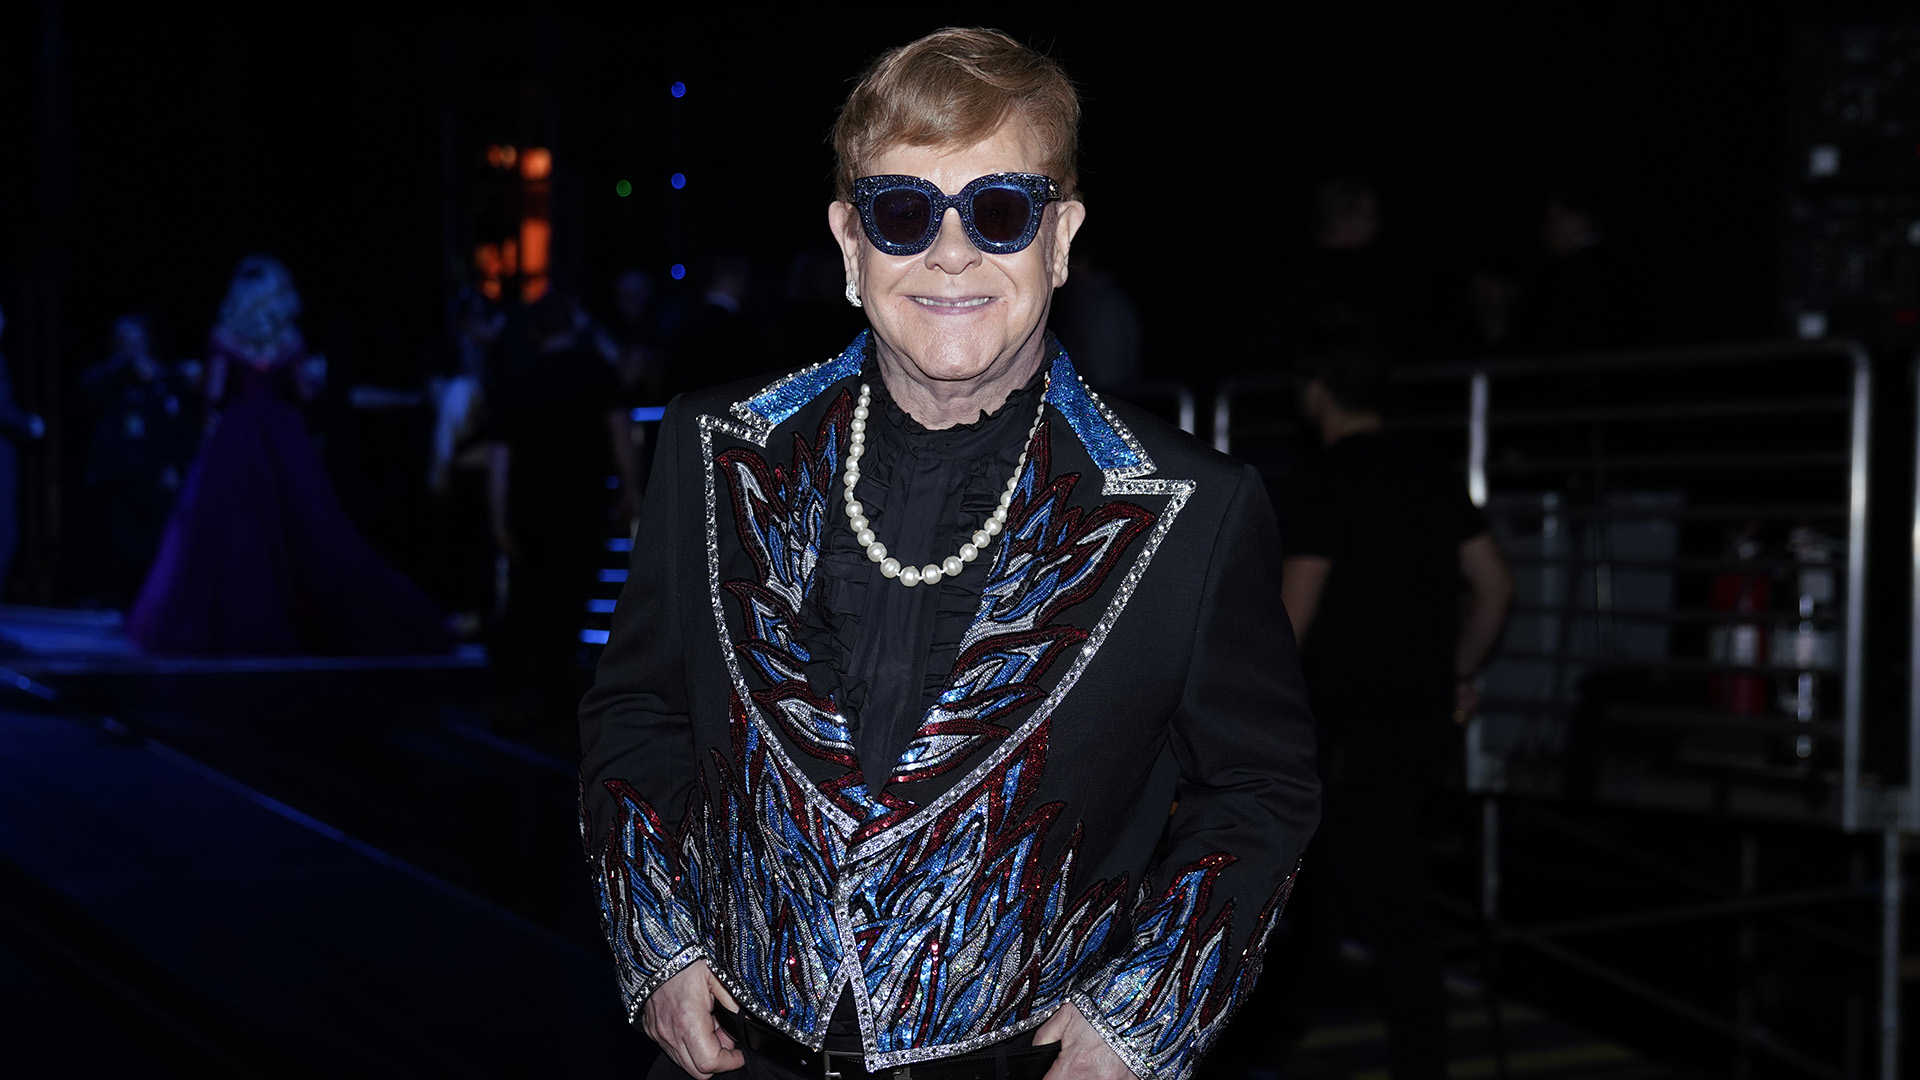 Performer Elton John, who took the Madison Square Garden stage to play